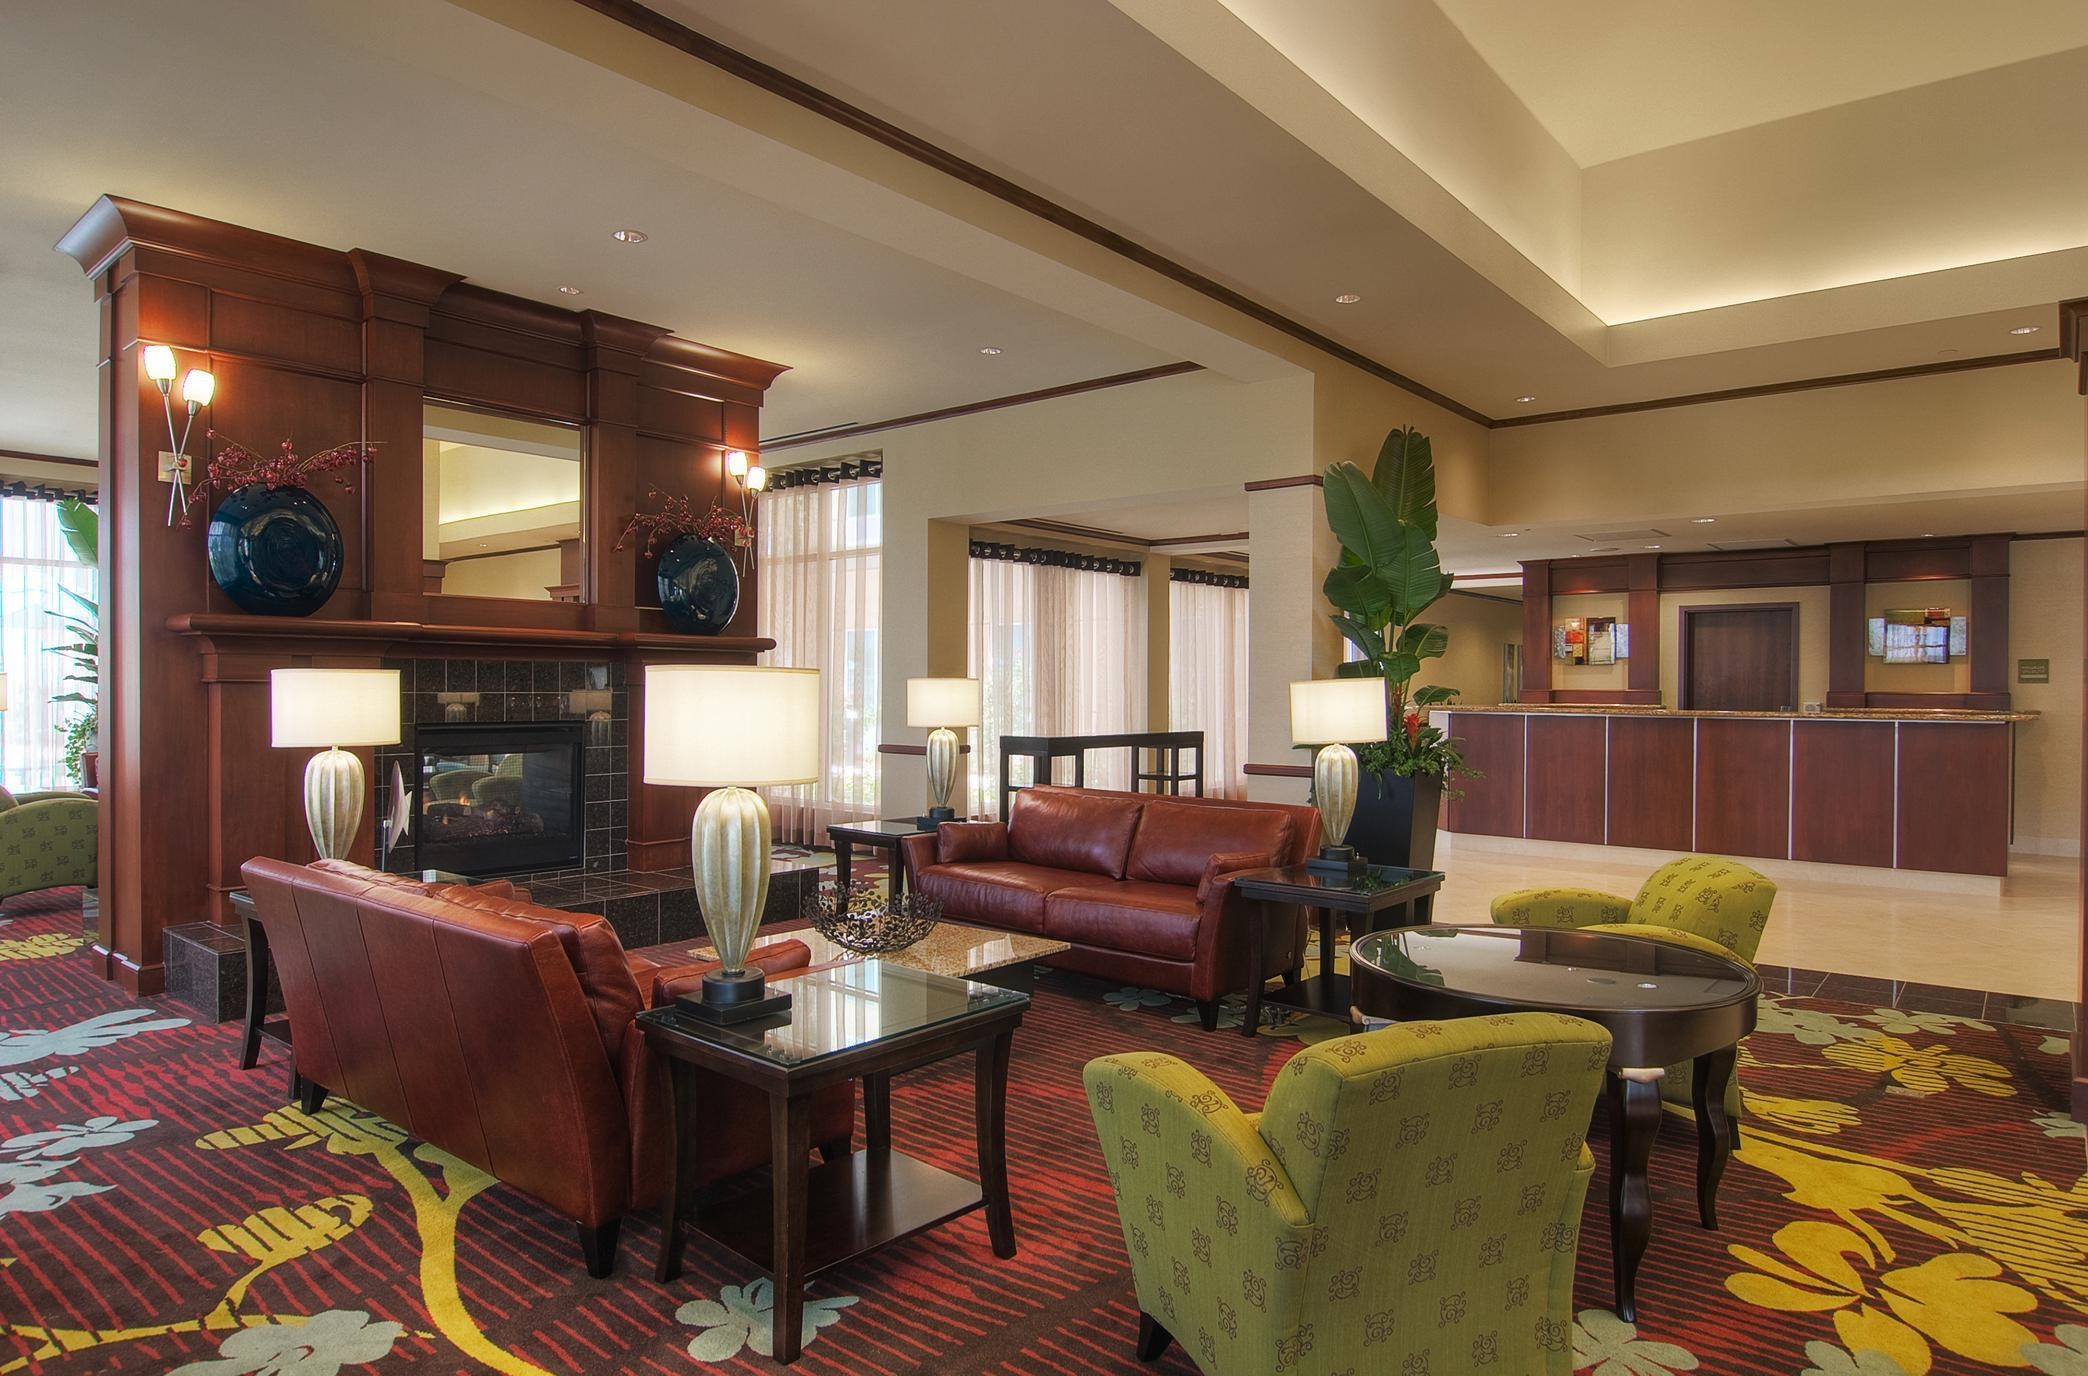 Hilton Garden Inn Houston-Pearland image 2